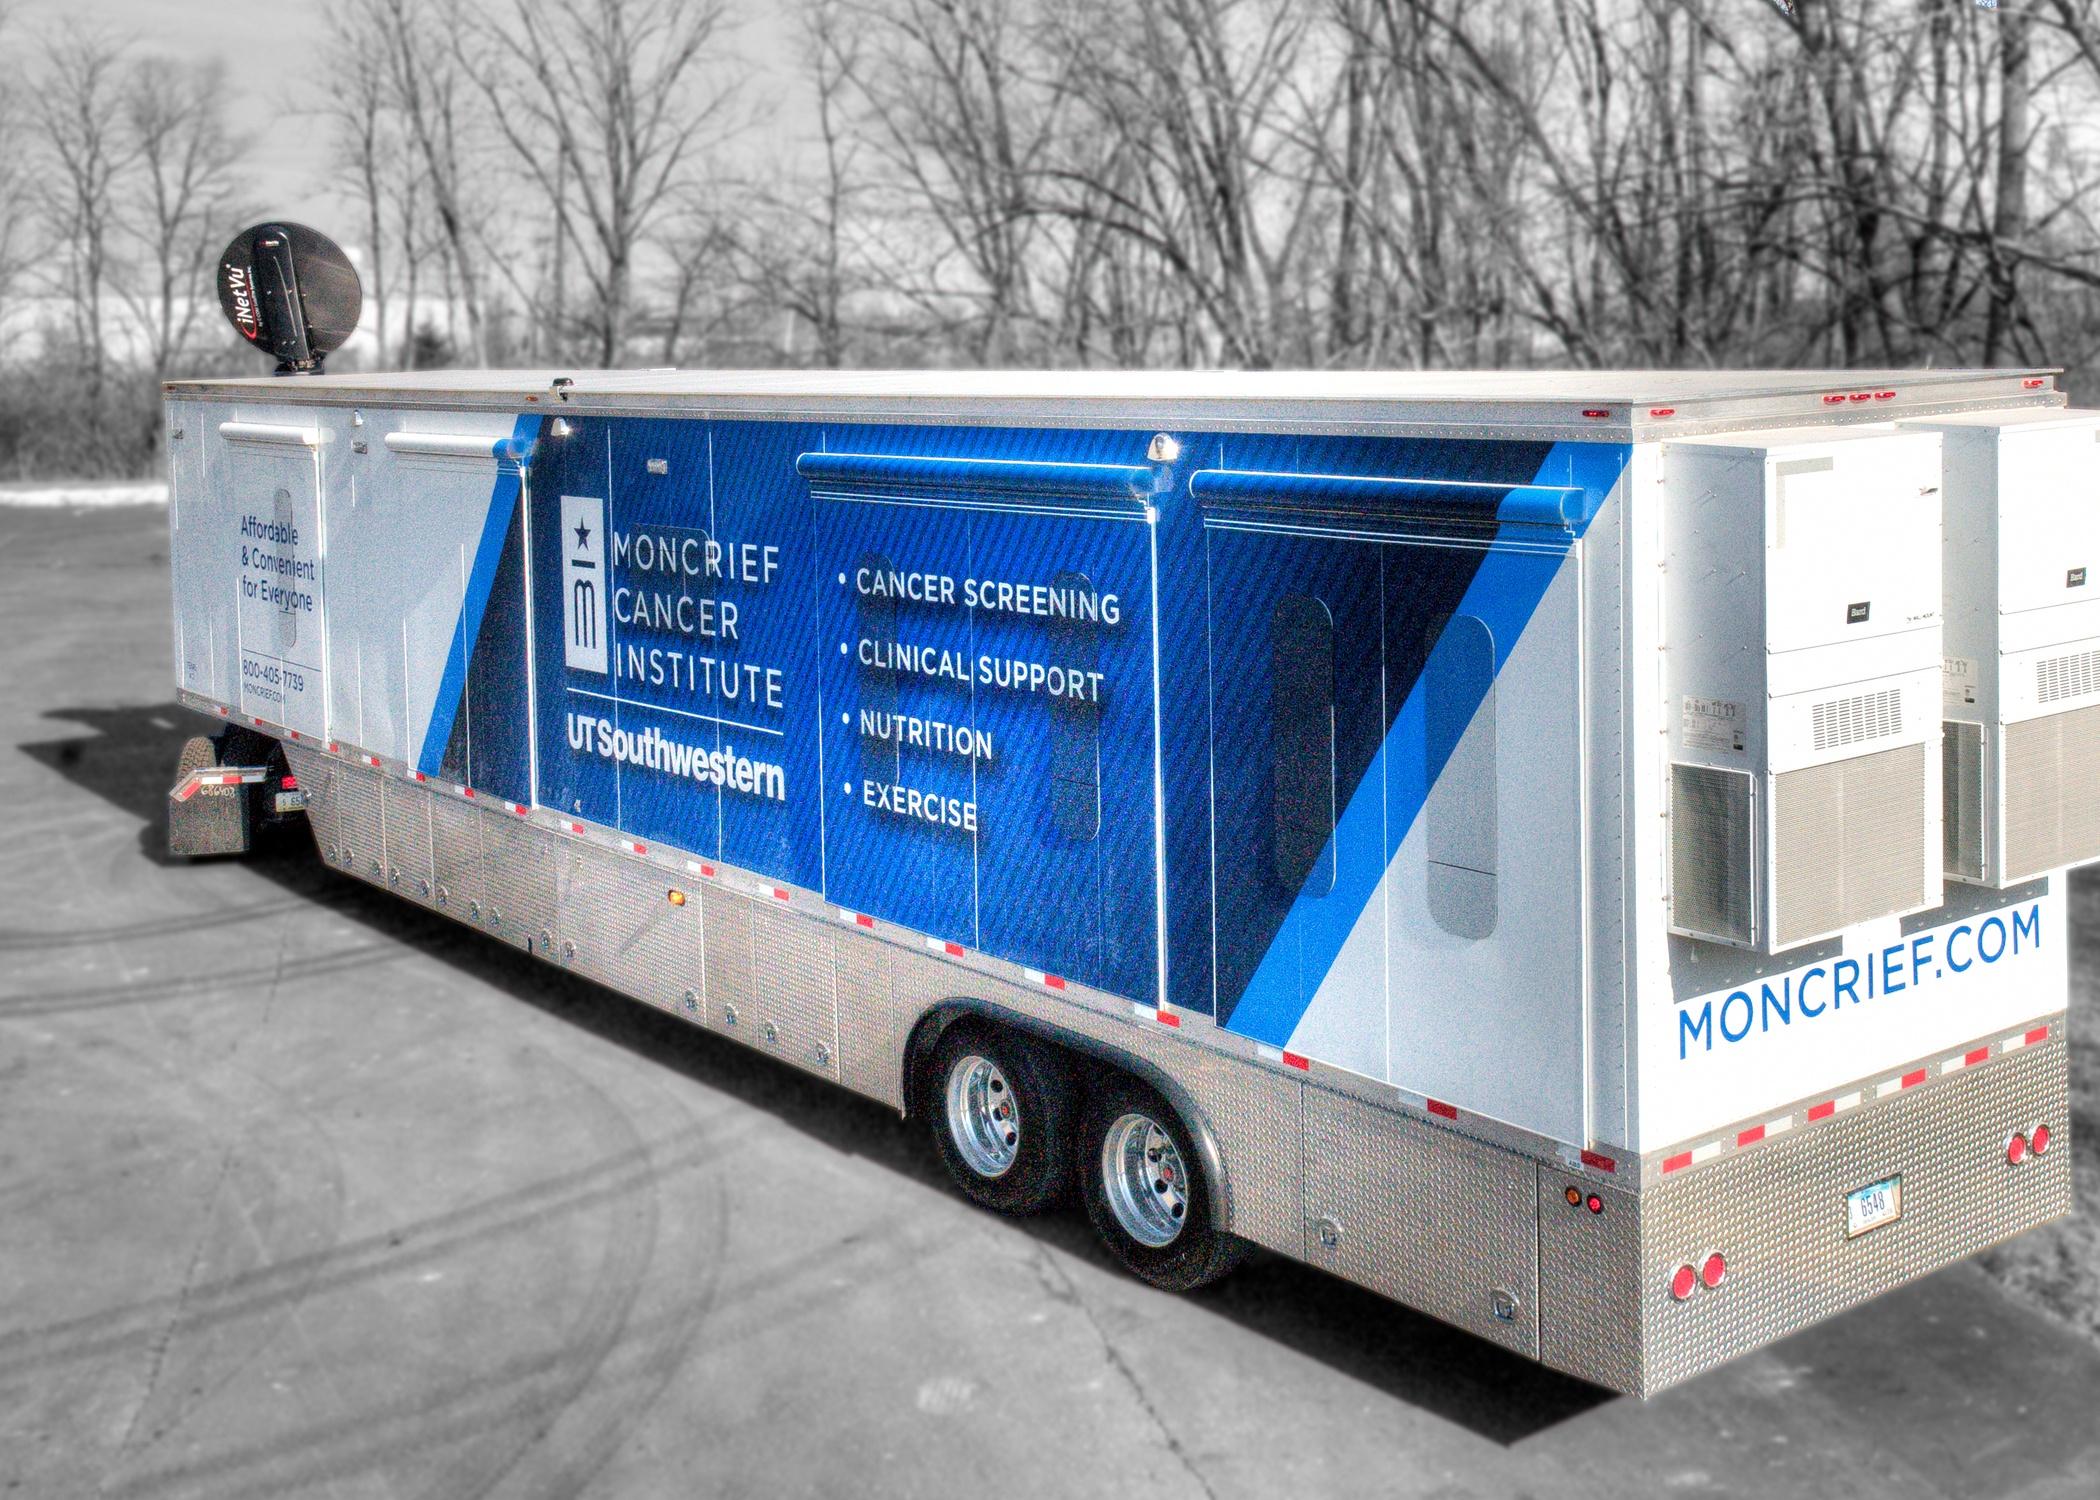 Moncrier Cancer Institute mobile mammogram unit